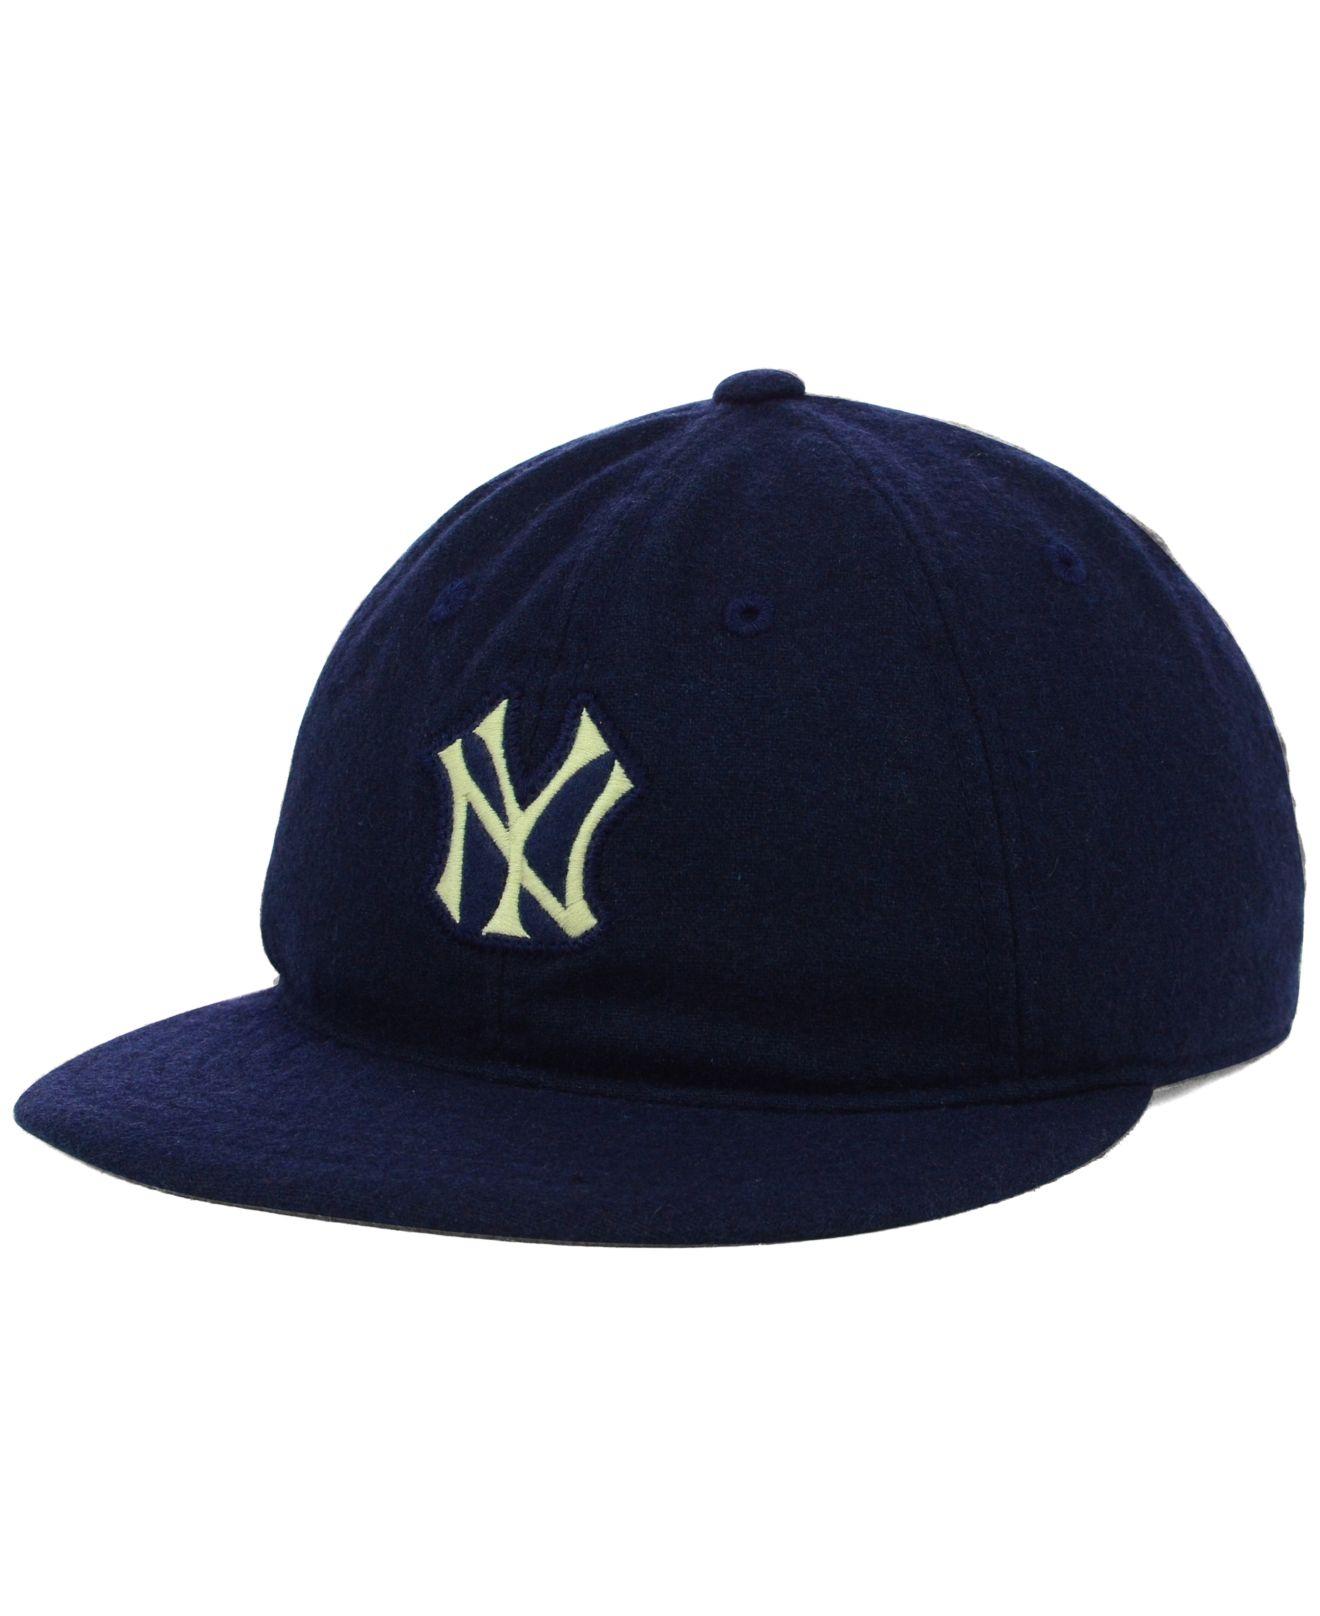 American Needle American New York Yankees Mlb Statesman